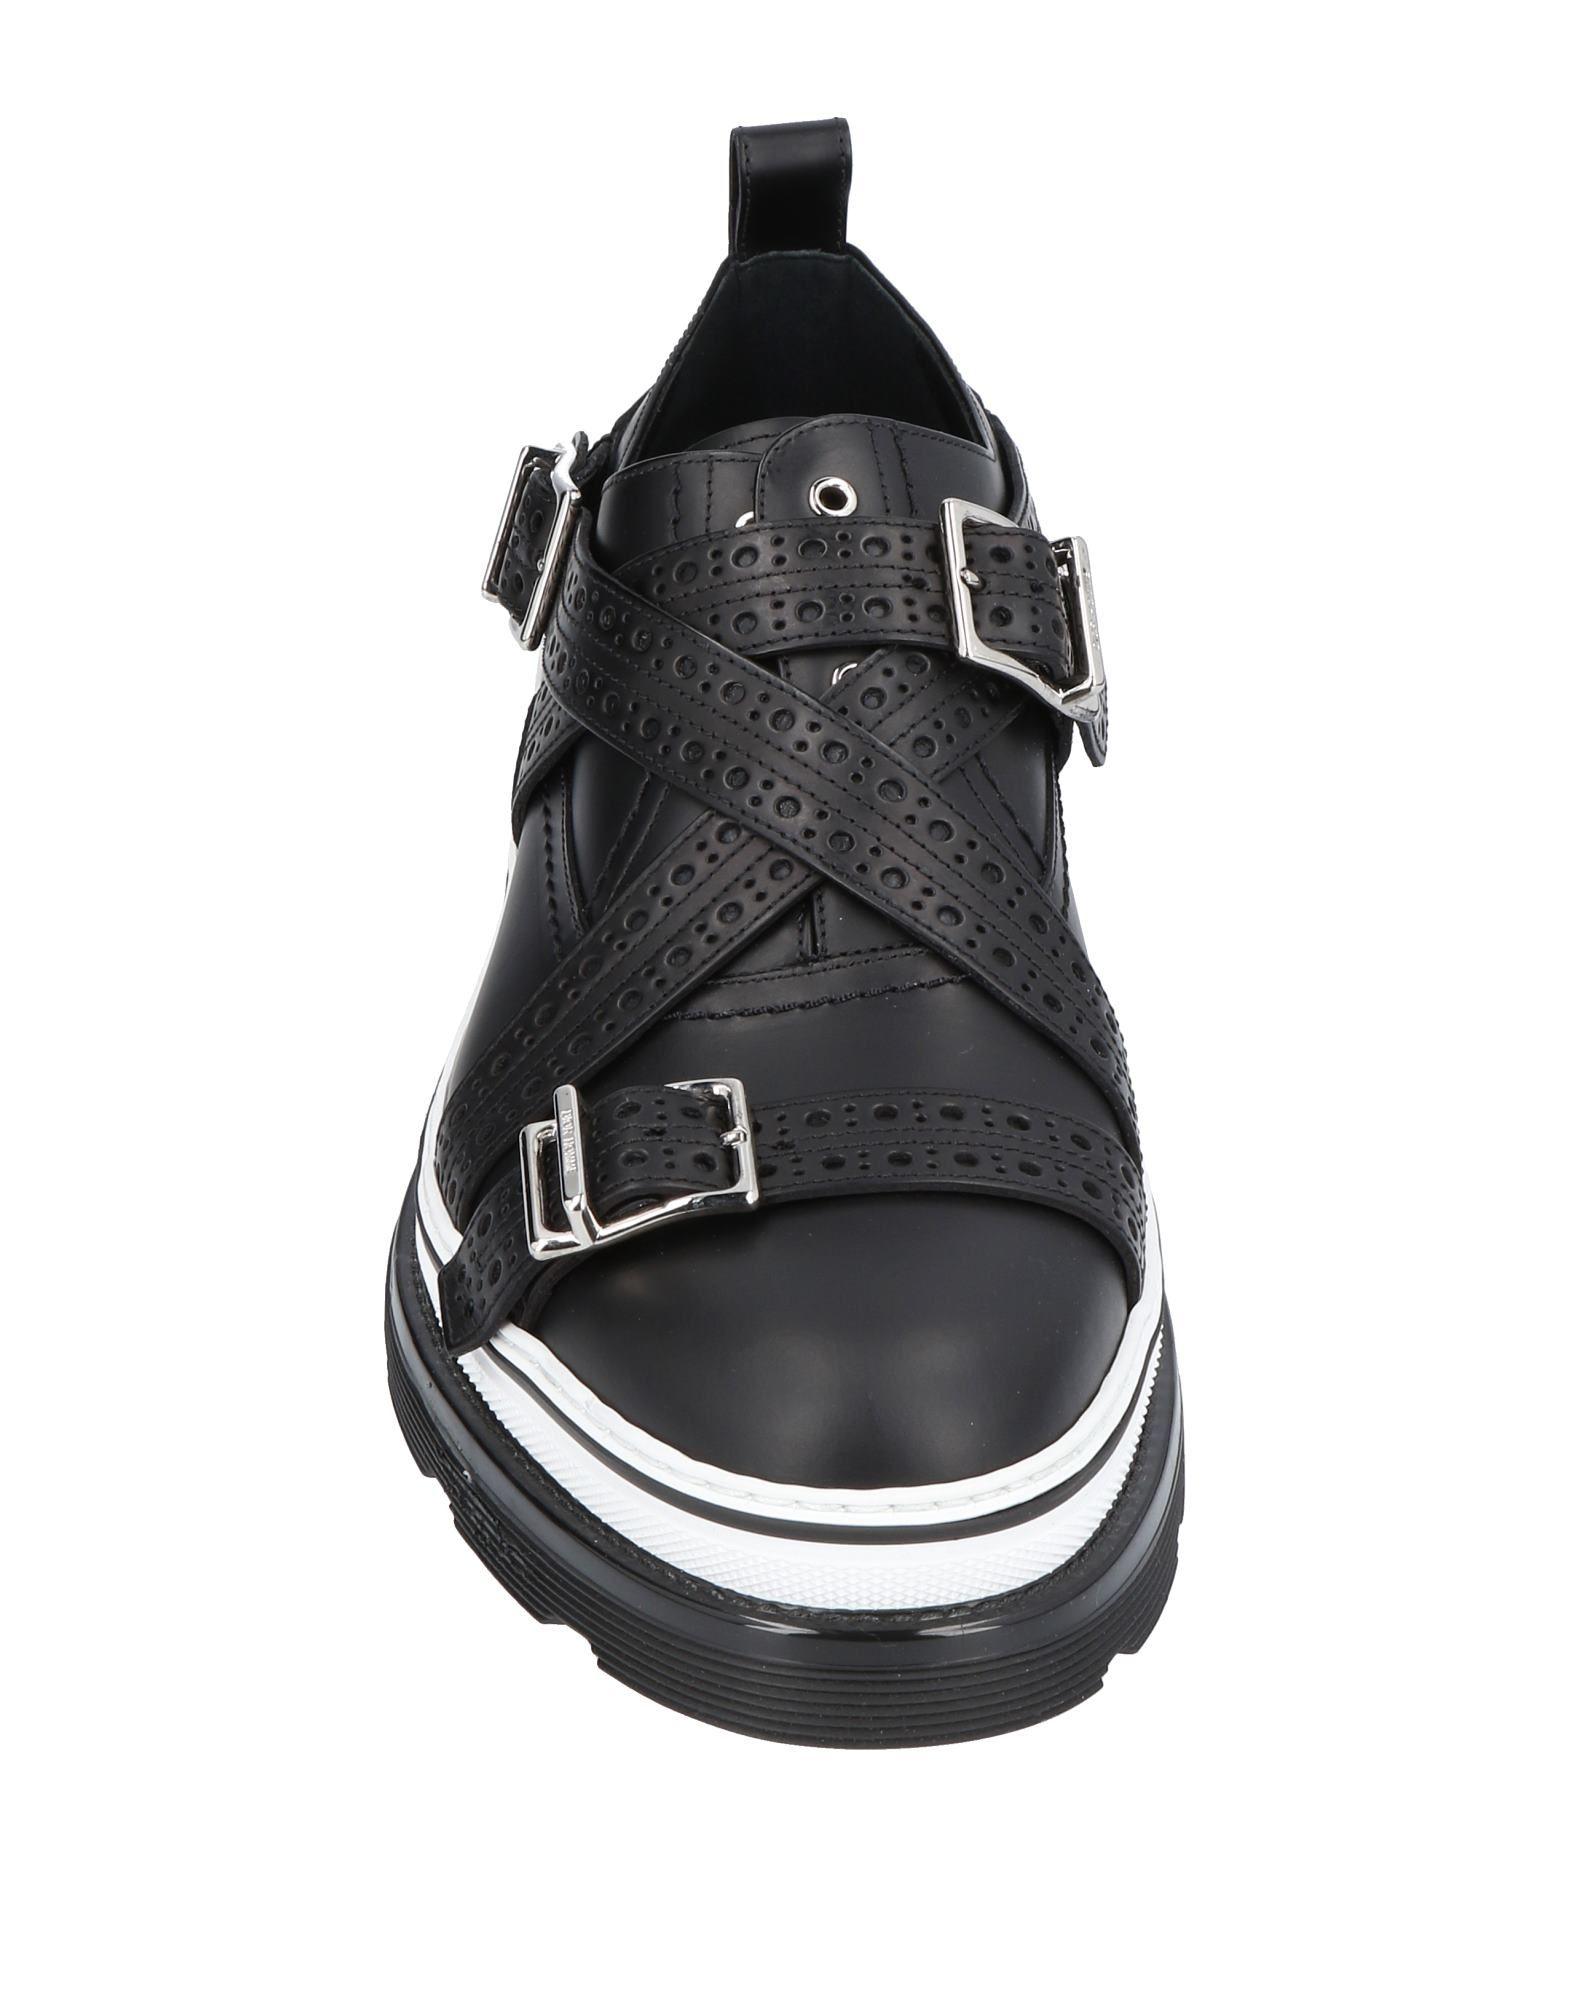 Dior Homme Mokassins Mokassins Mokassins Herren  11462574IE Neue Schuhe 4a2b9c